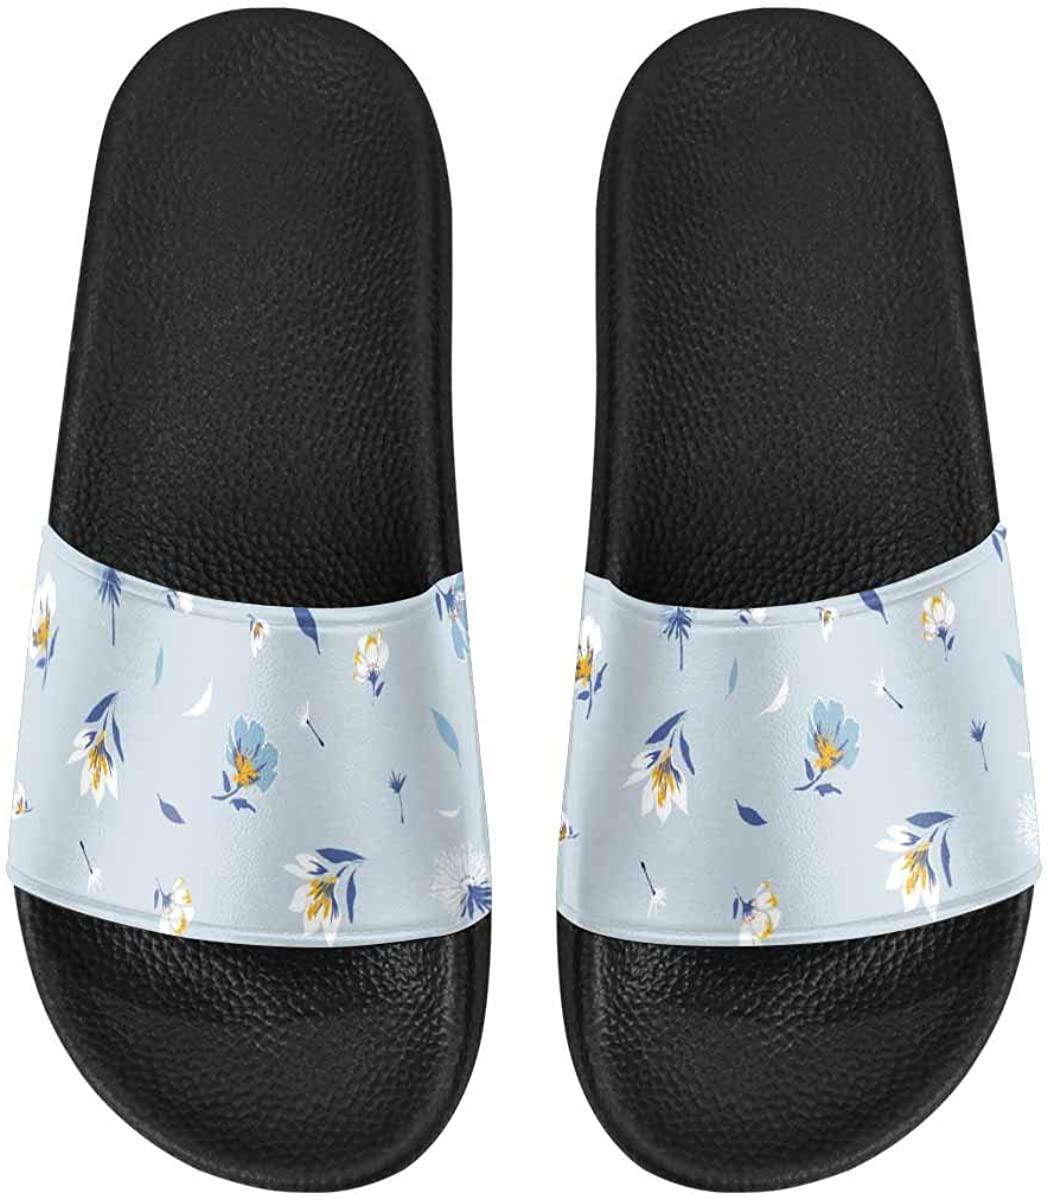 INTERESTPRINT The Blooming Botanical Motifs Men's Walking Beach and Pool Shoes Lightweight Sandals